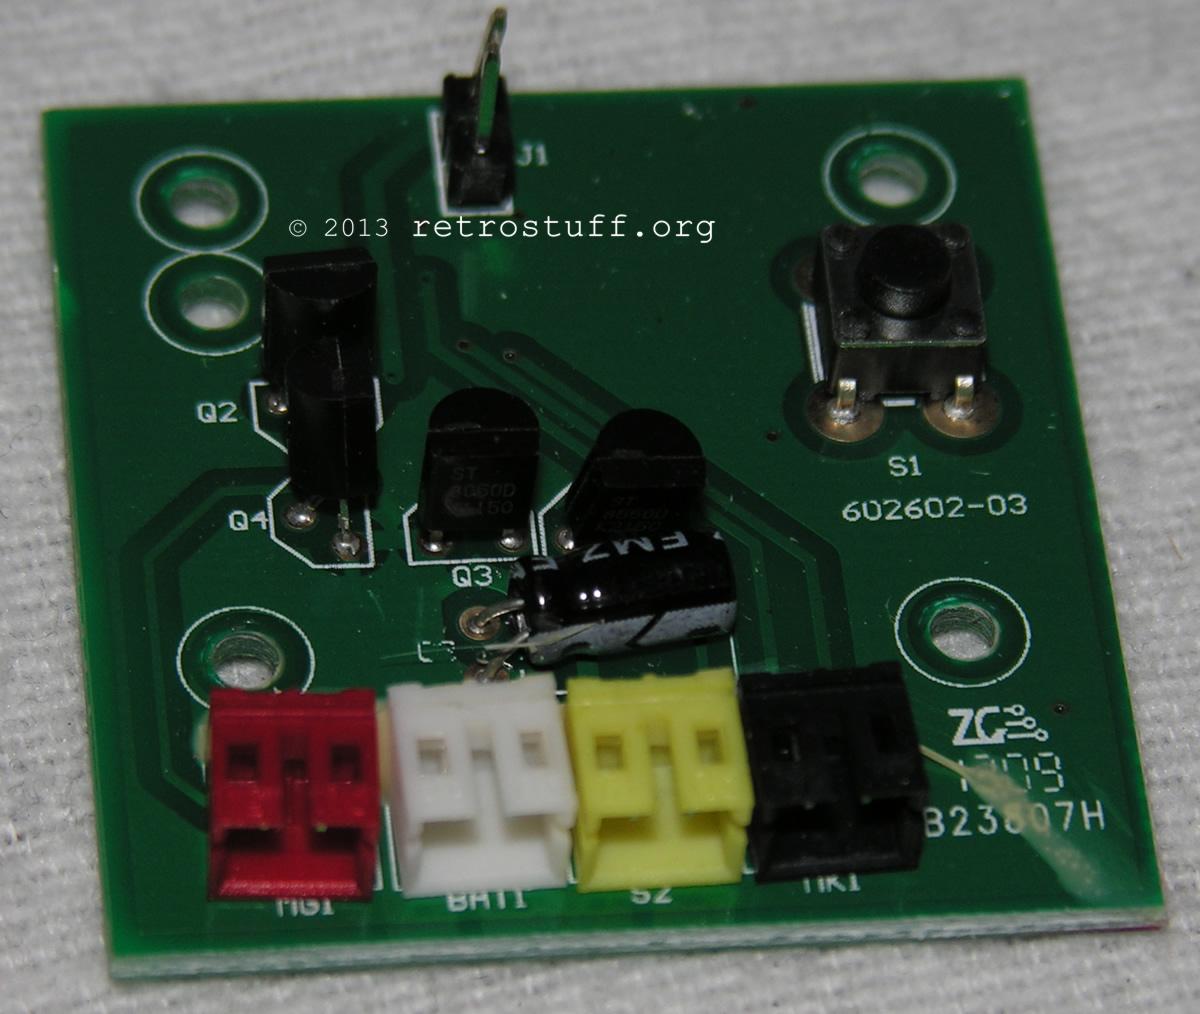 Mocoro PCB front